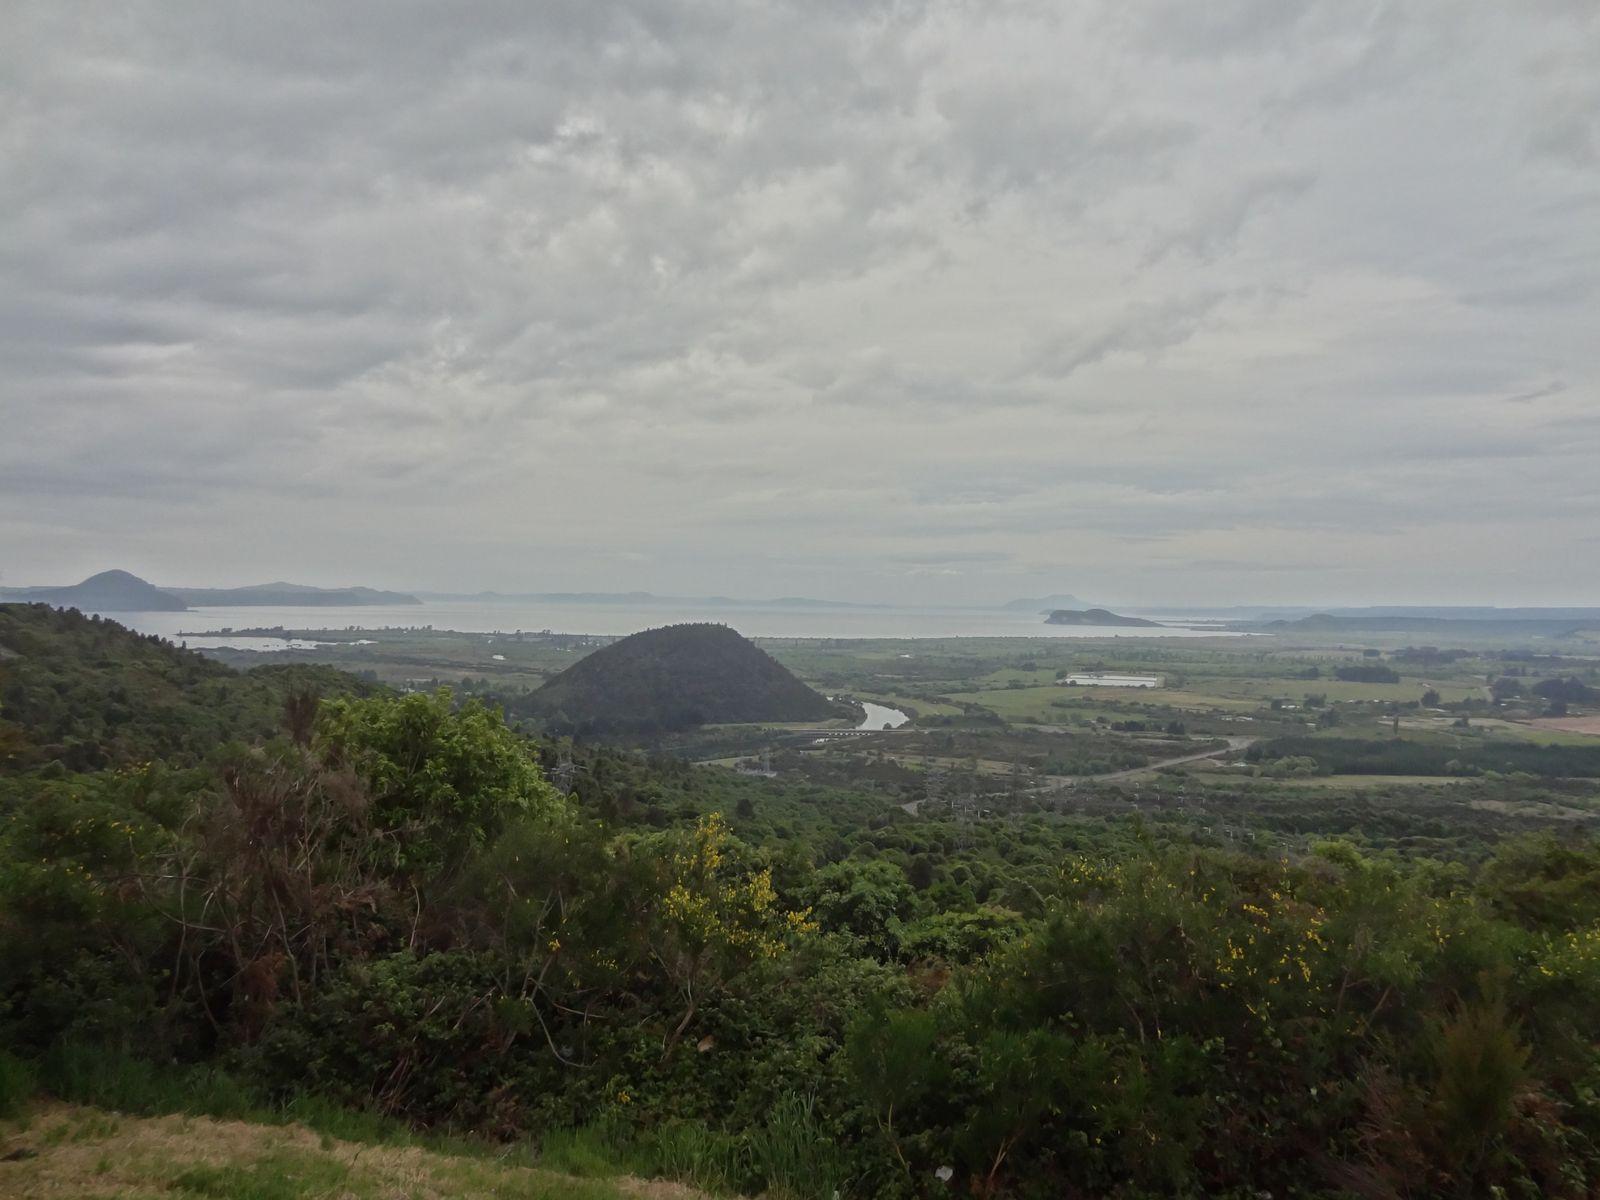 Taupo Turangi - 5 décembre 2012